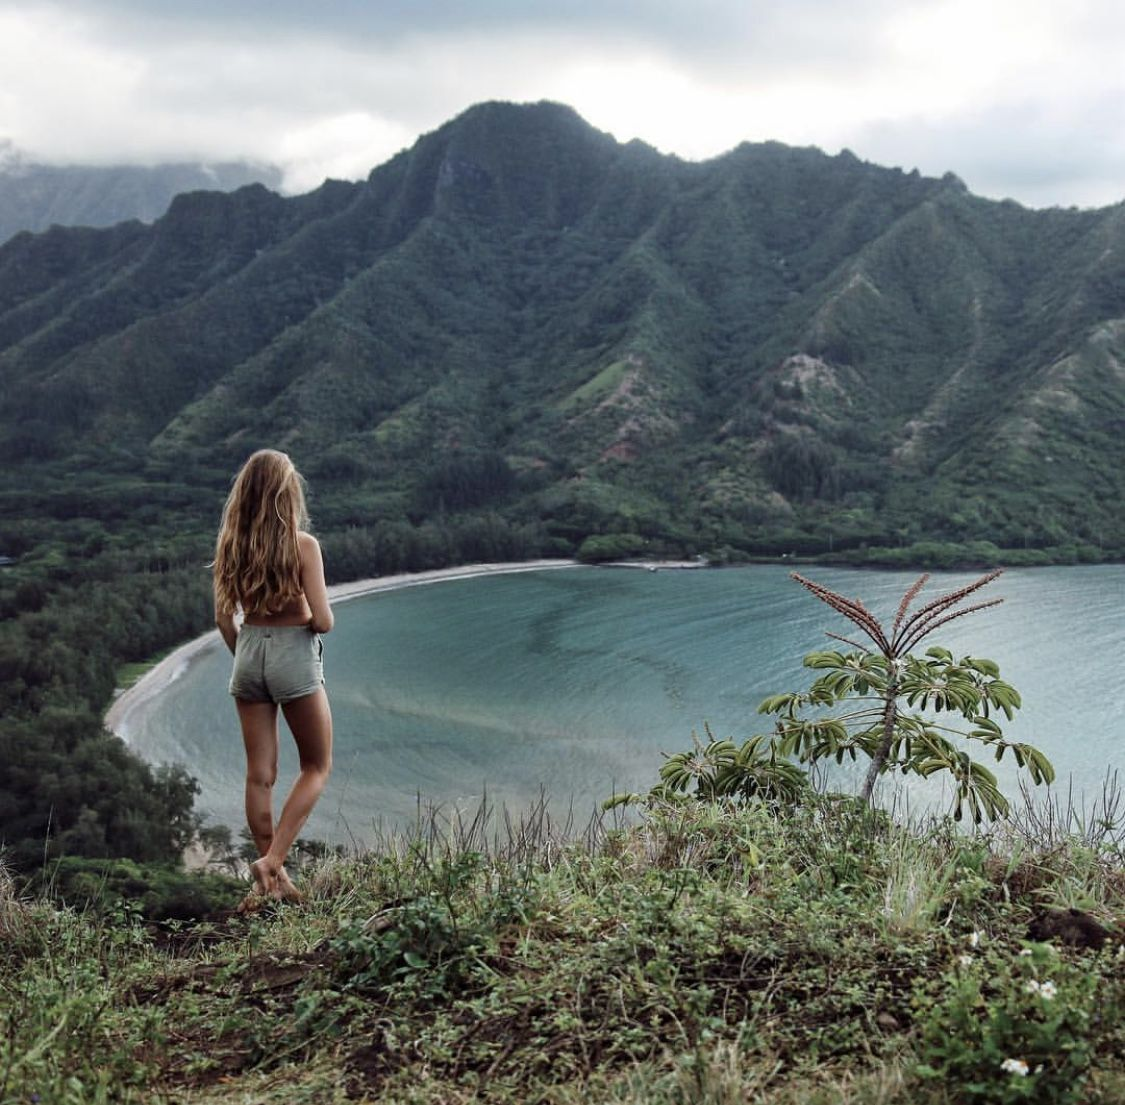 plantifulsoul | Travel, Adventure, Travel photography